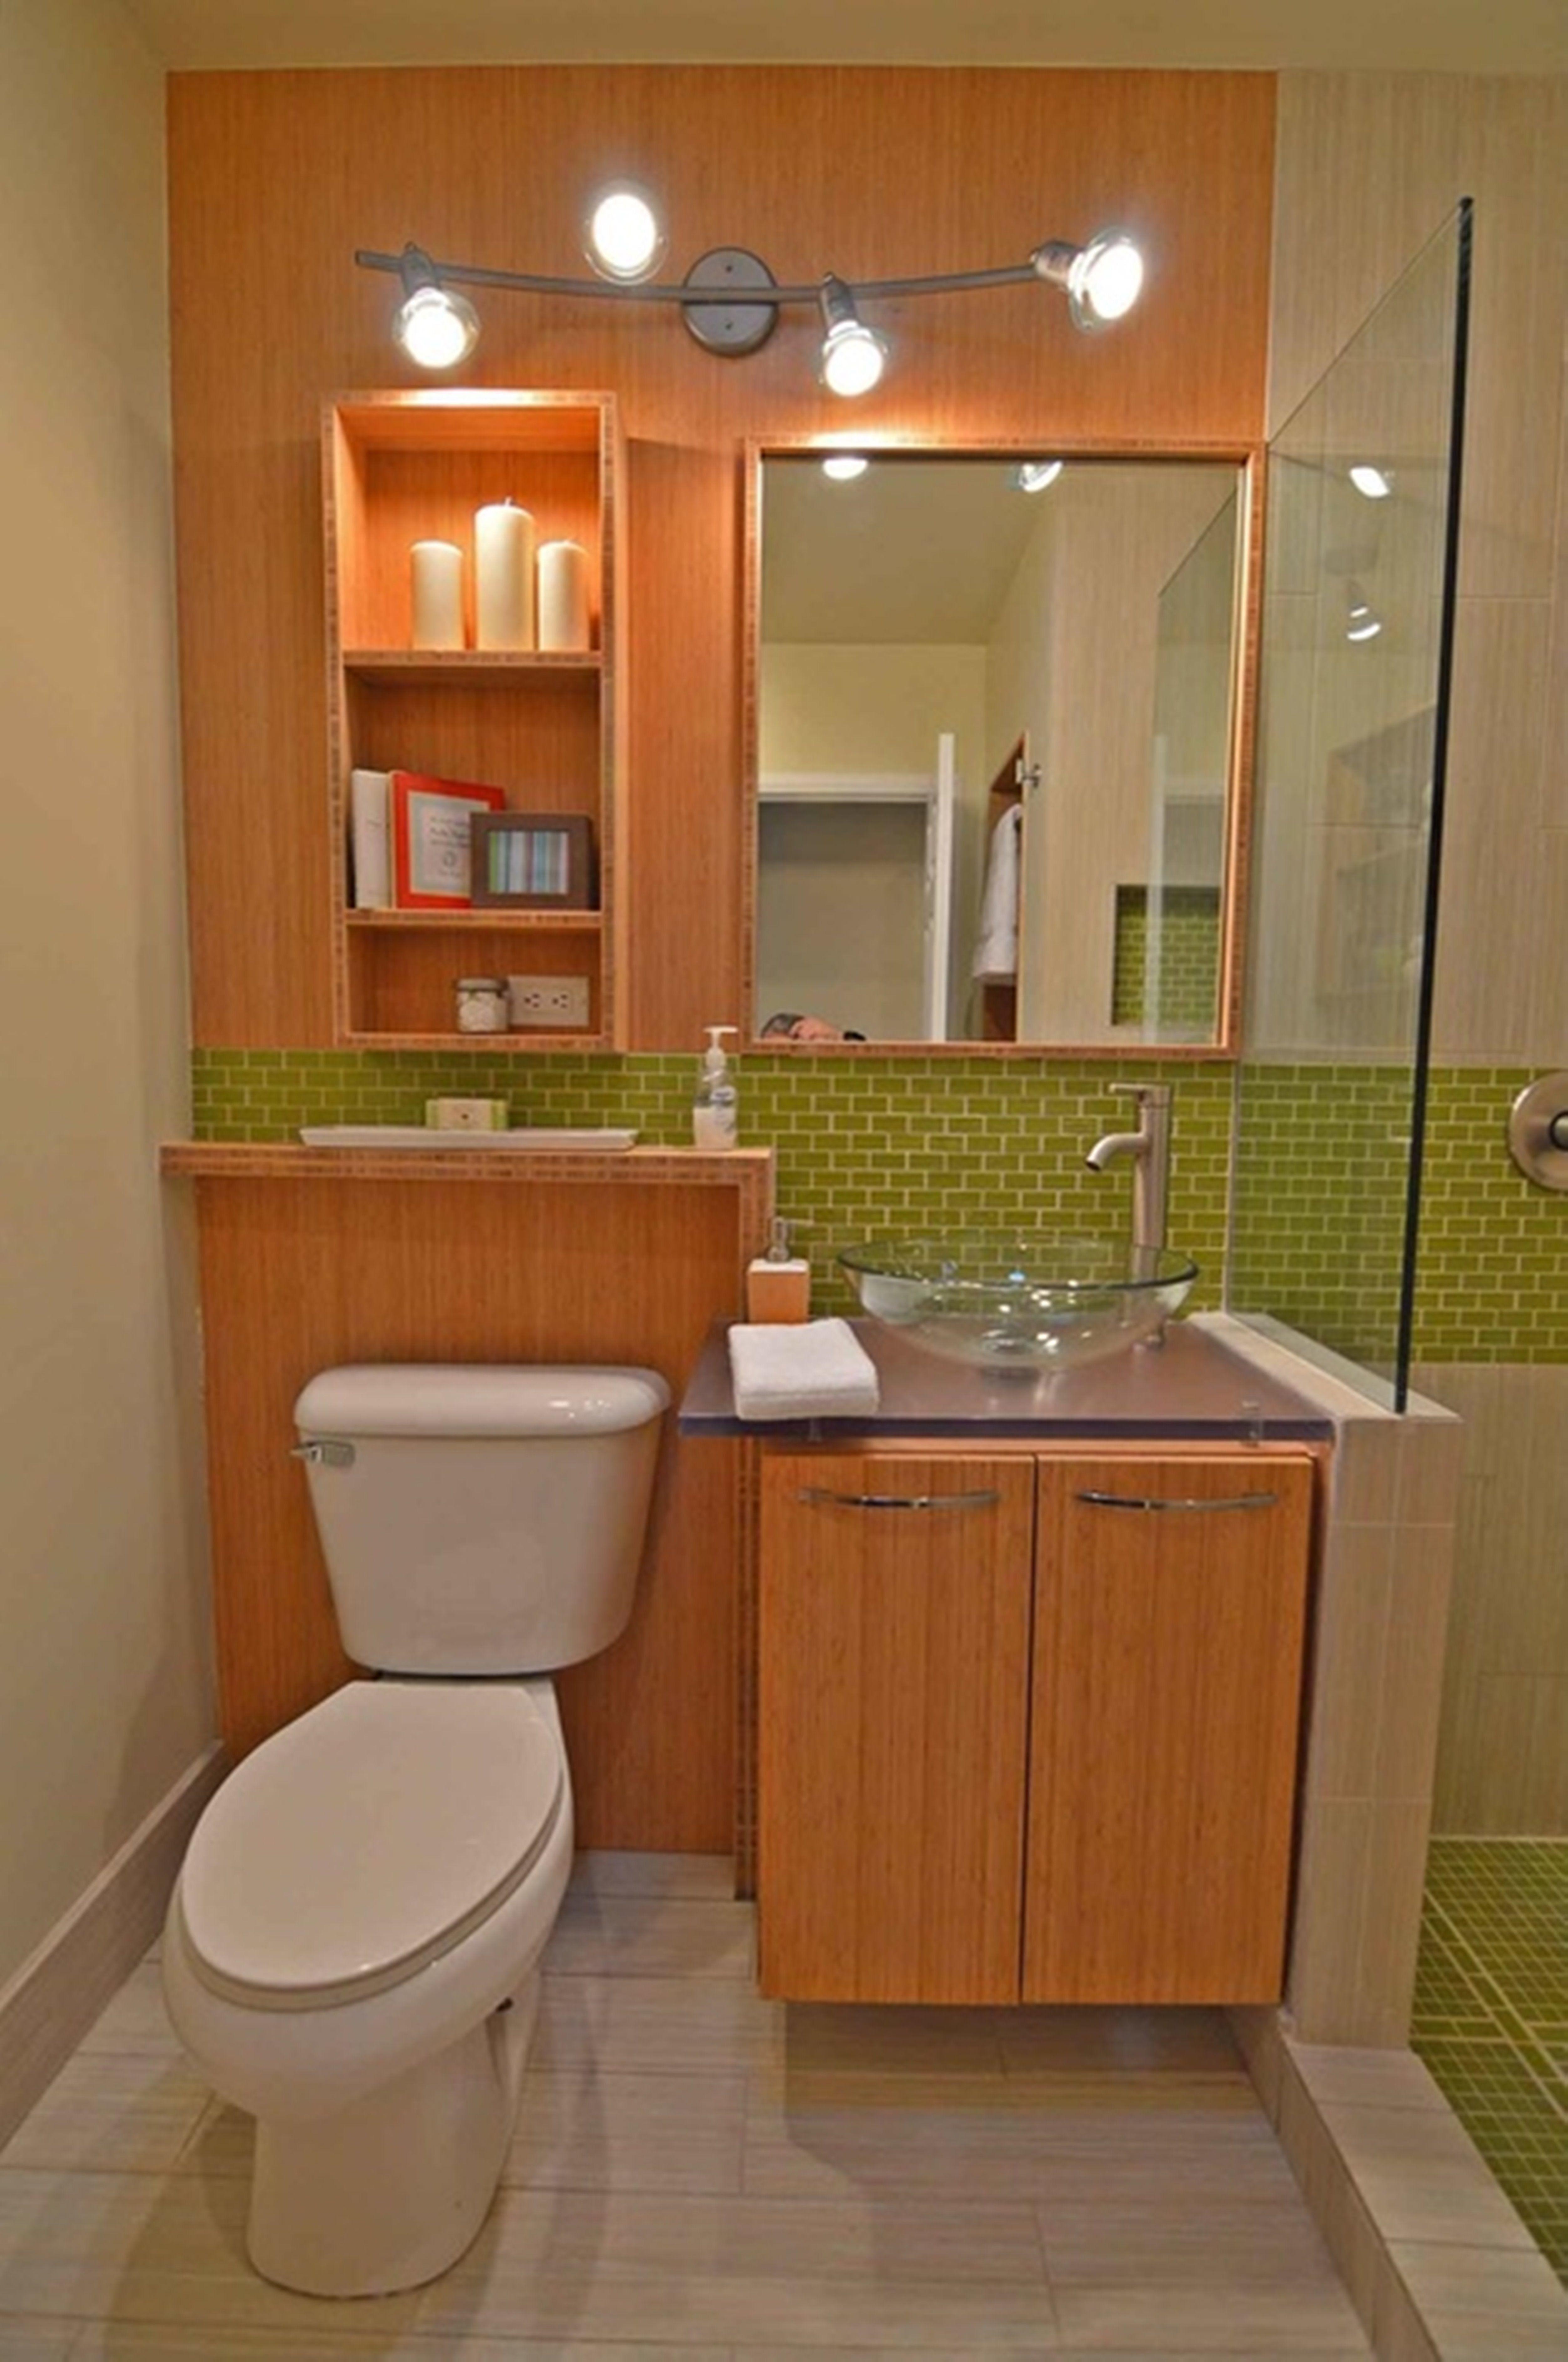 bathroom doorless shower ideas. Doorless Showers For Small Bathrooms On Glamorous Home Decor Diy Ideas 59 About Bathroom Shower E